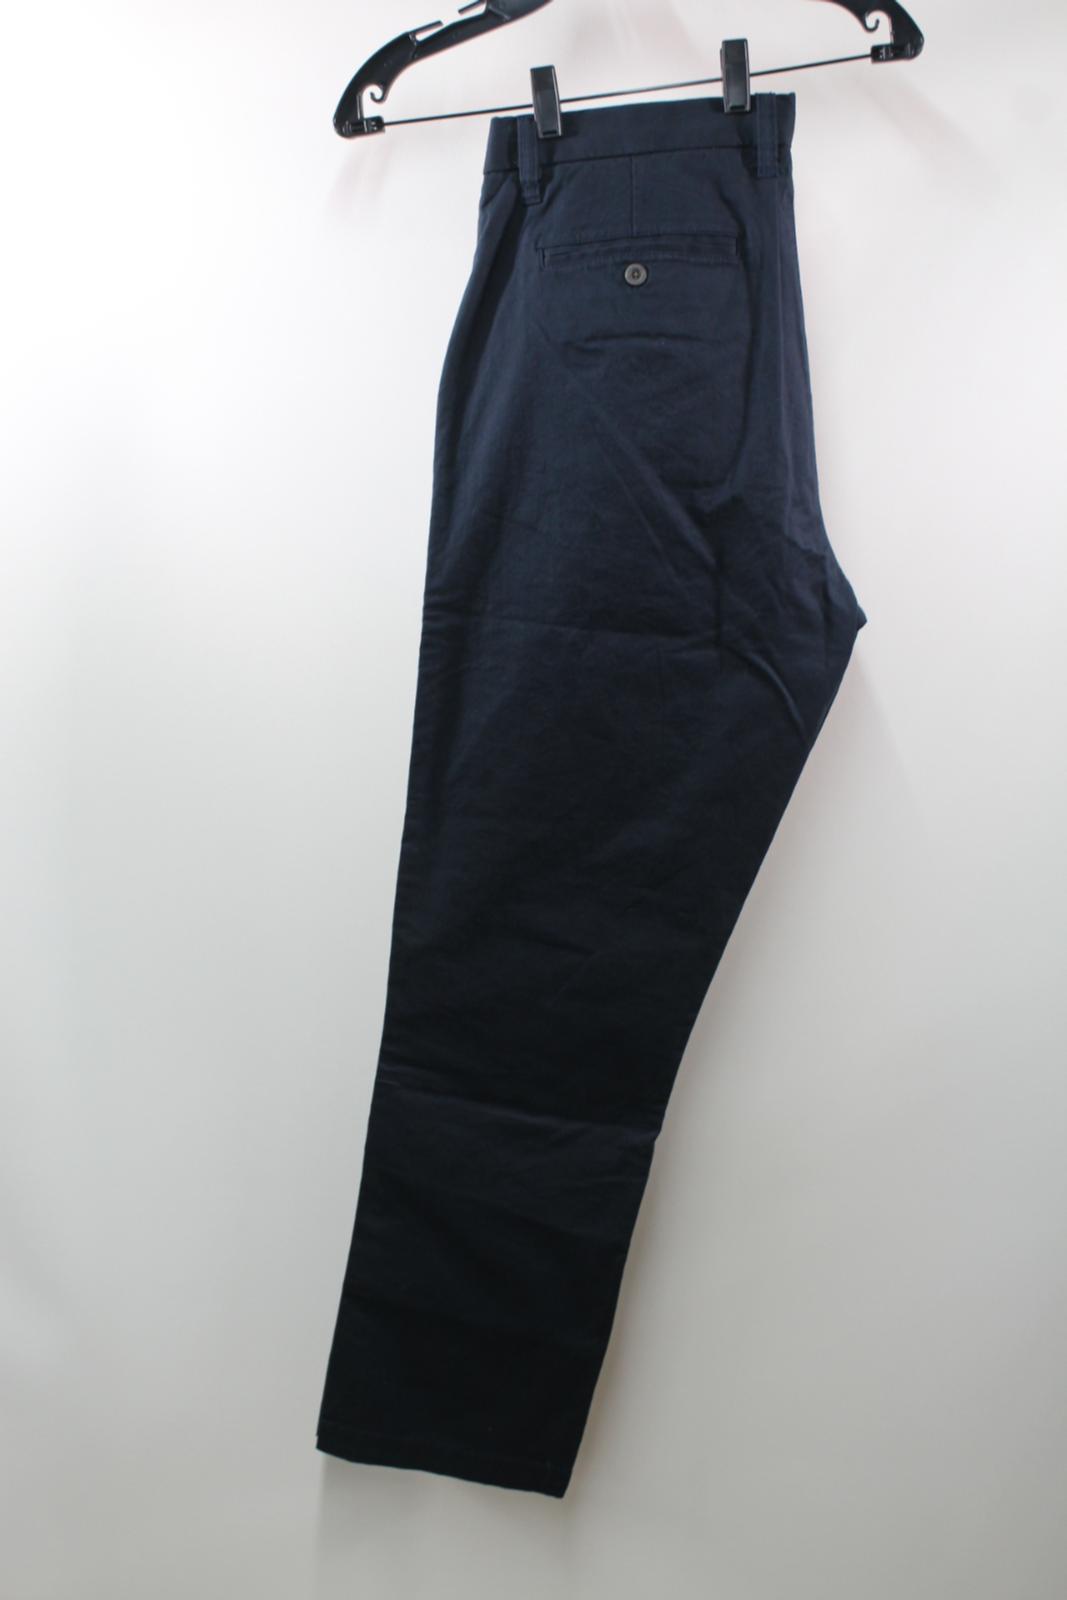 BNWT R.M. R.M. R.M. WILLIAMS Men's Navy Blau Stretch Cotton Trousers Chinos W36 L30 3de962